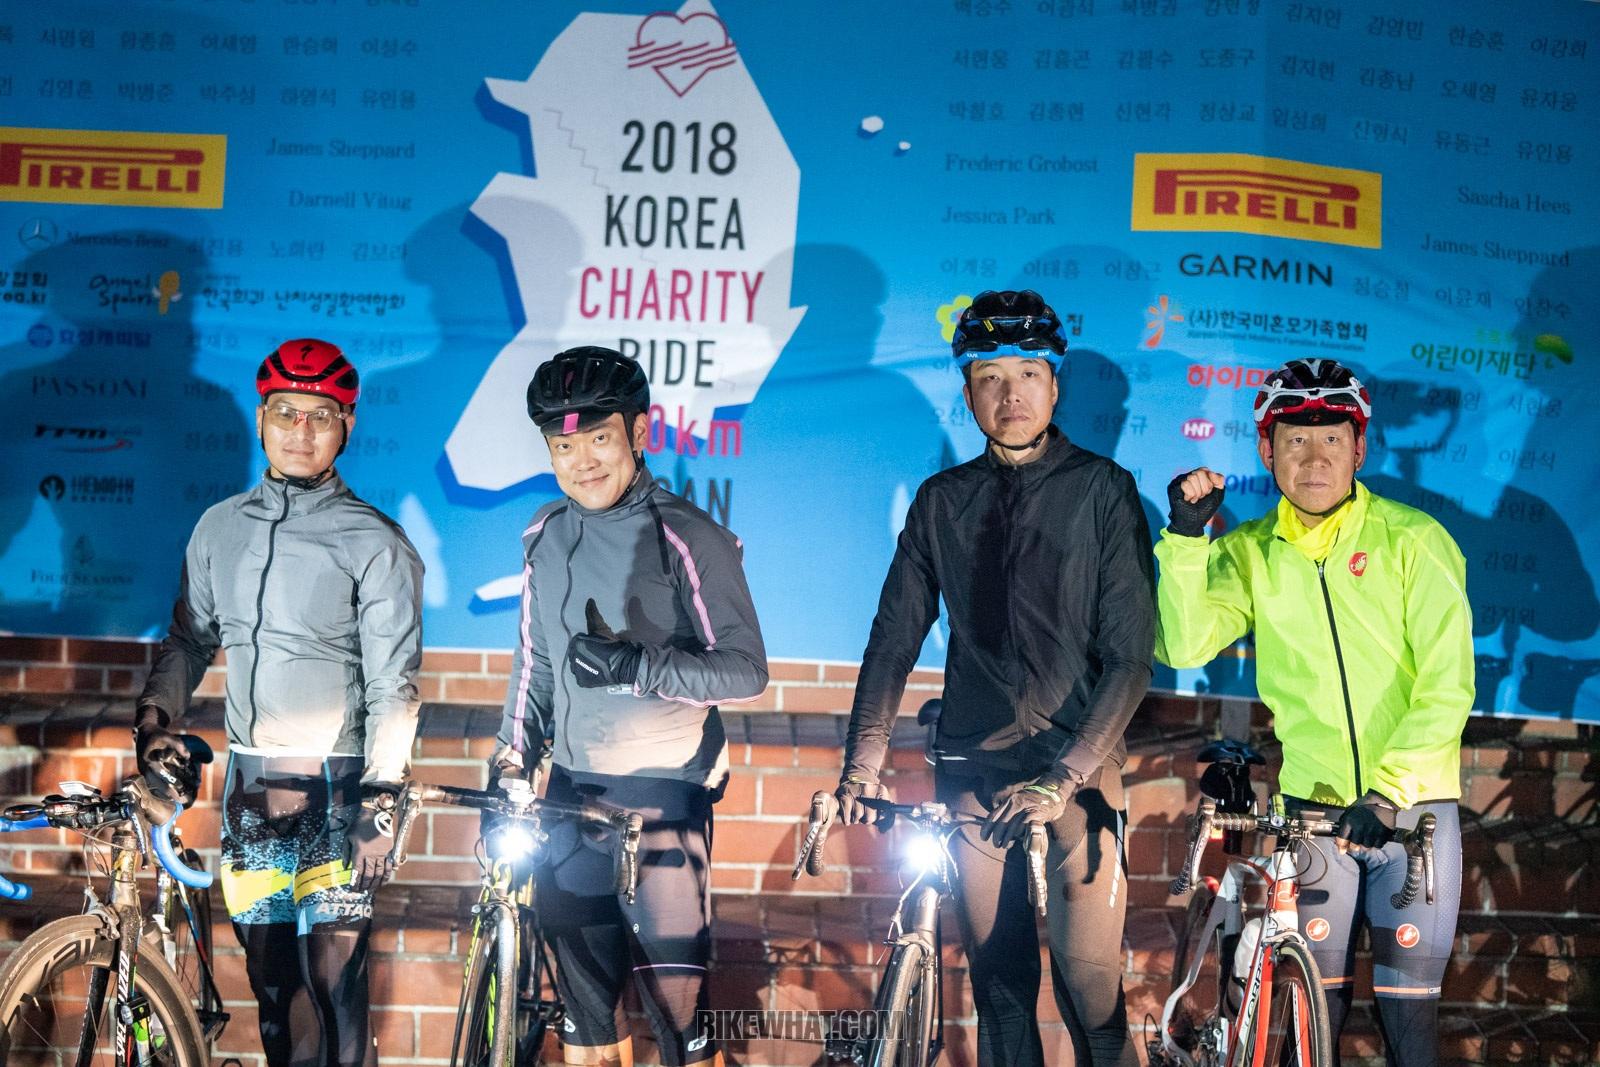 Charity_ride_2018 (24).jpg